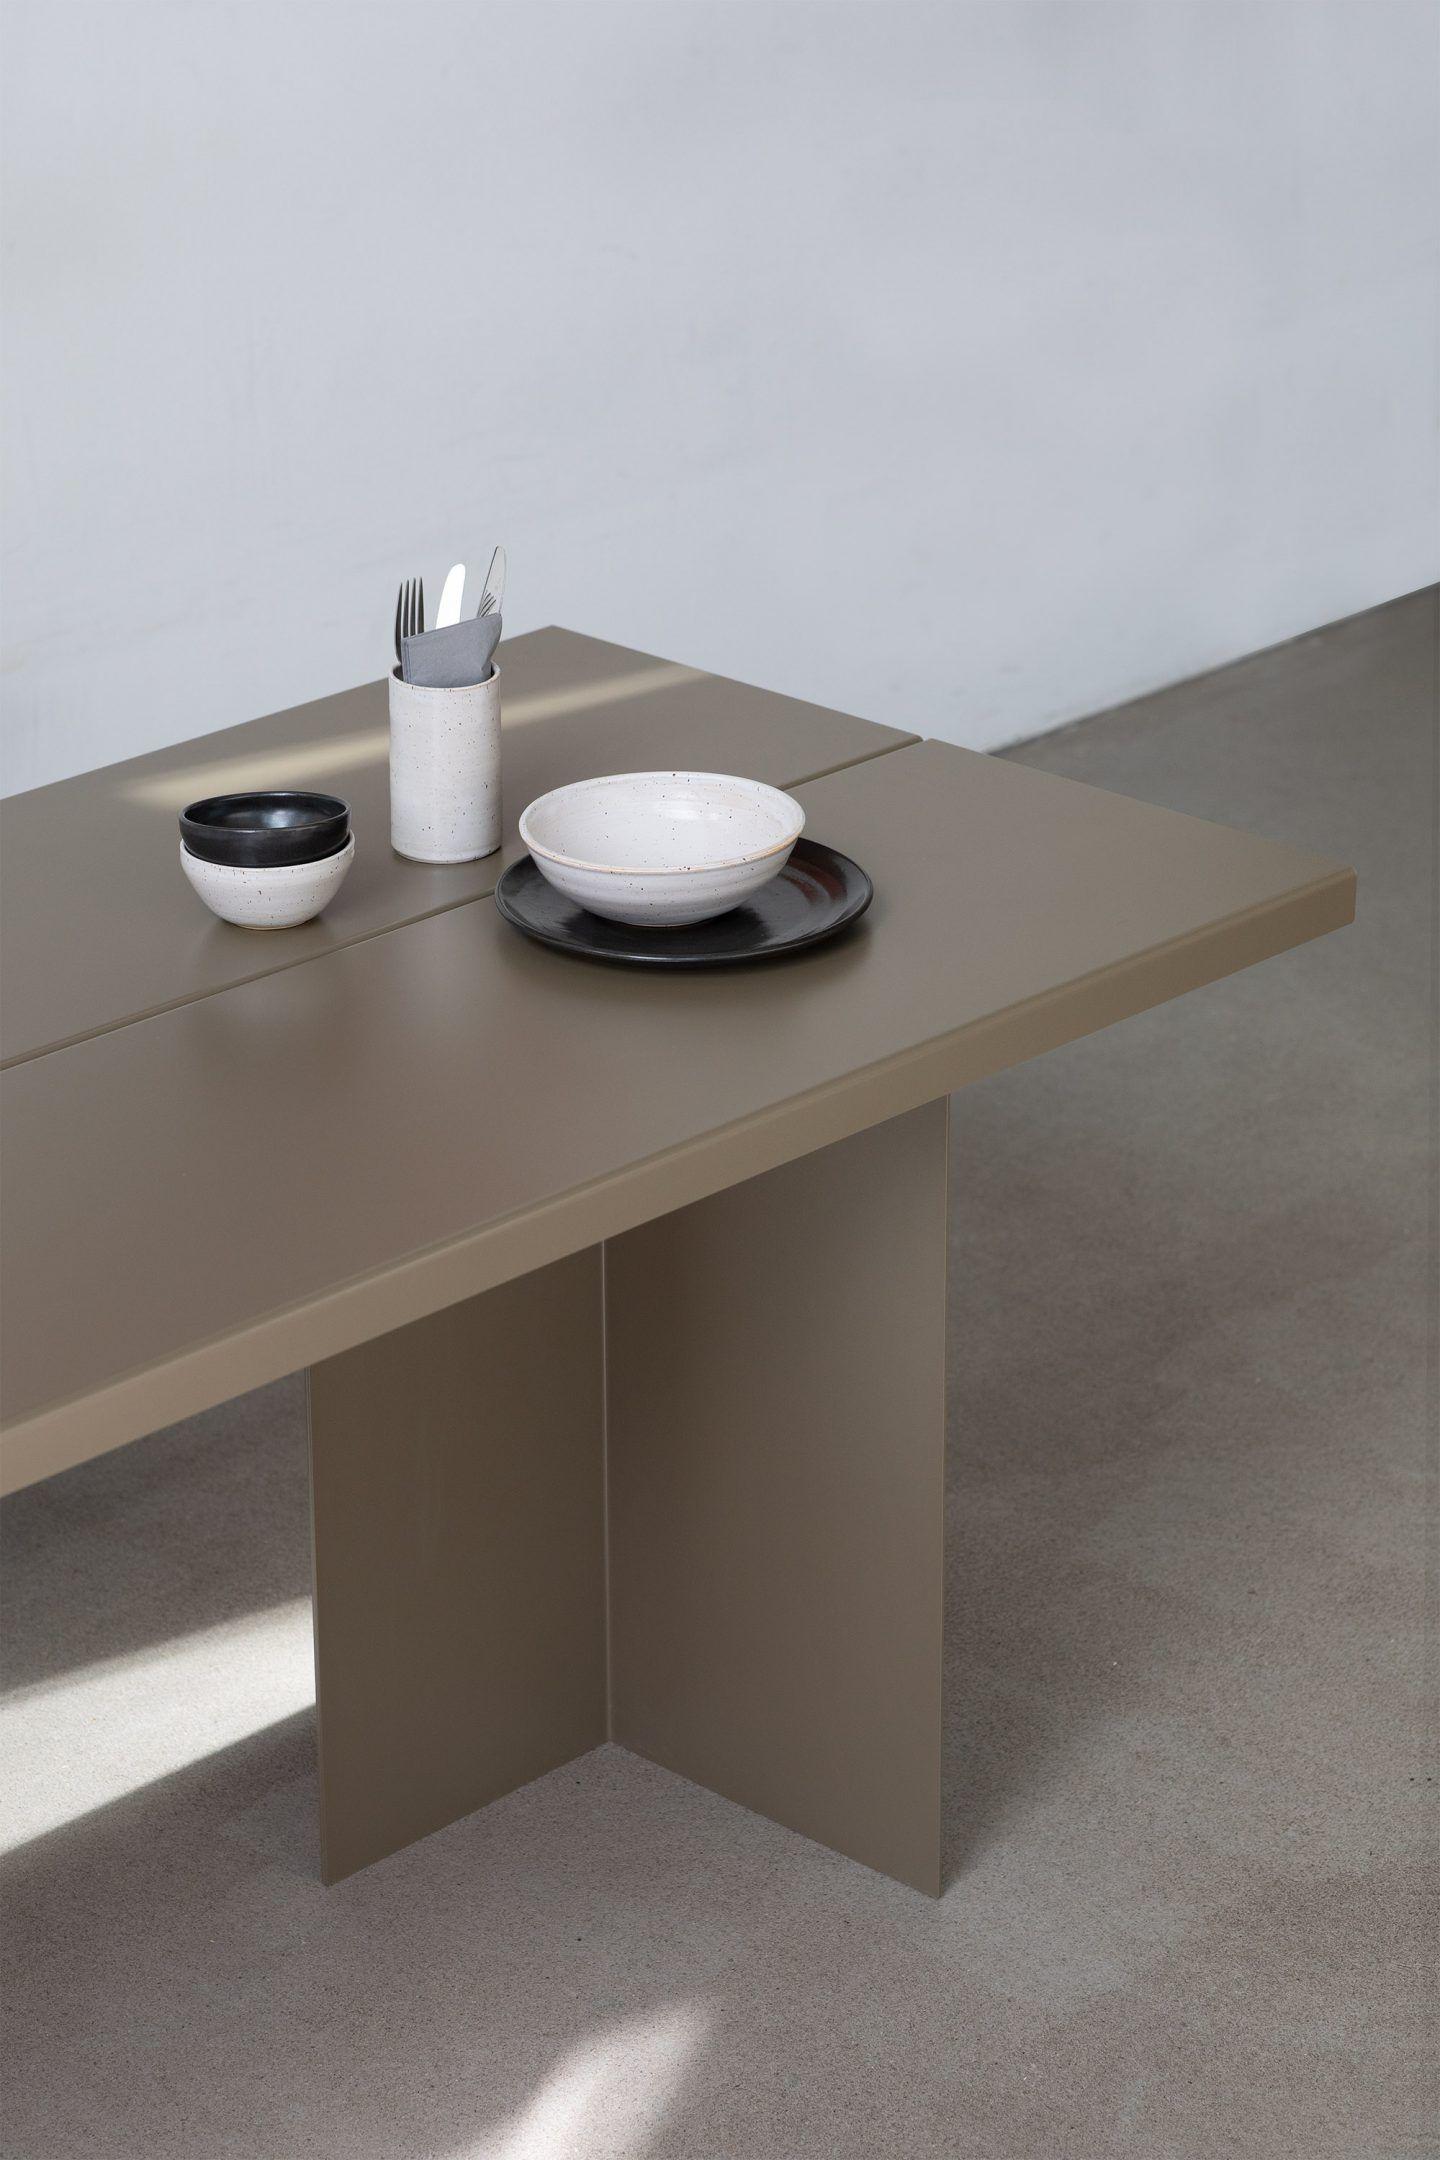 IGNANT-Design-Objekte-Unserer-Tage-Zebe-Table-9